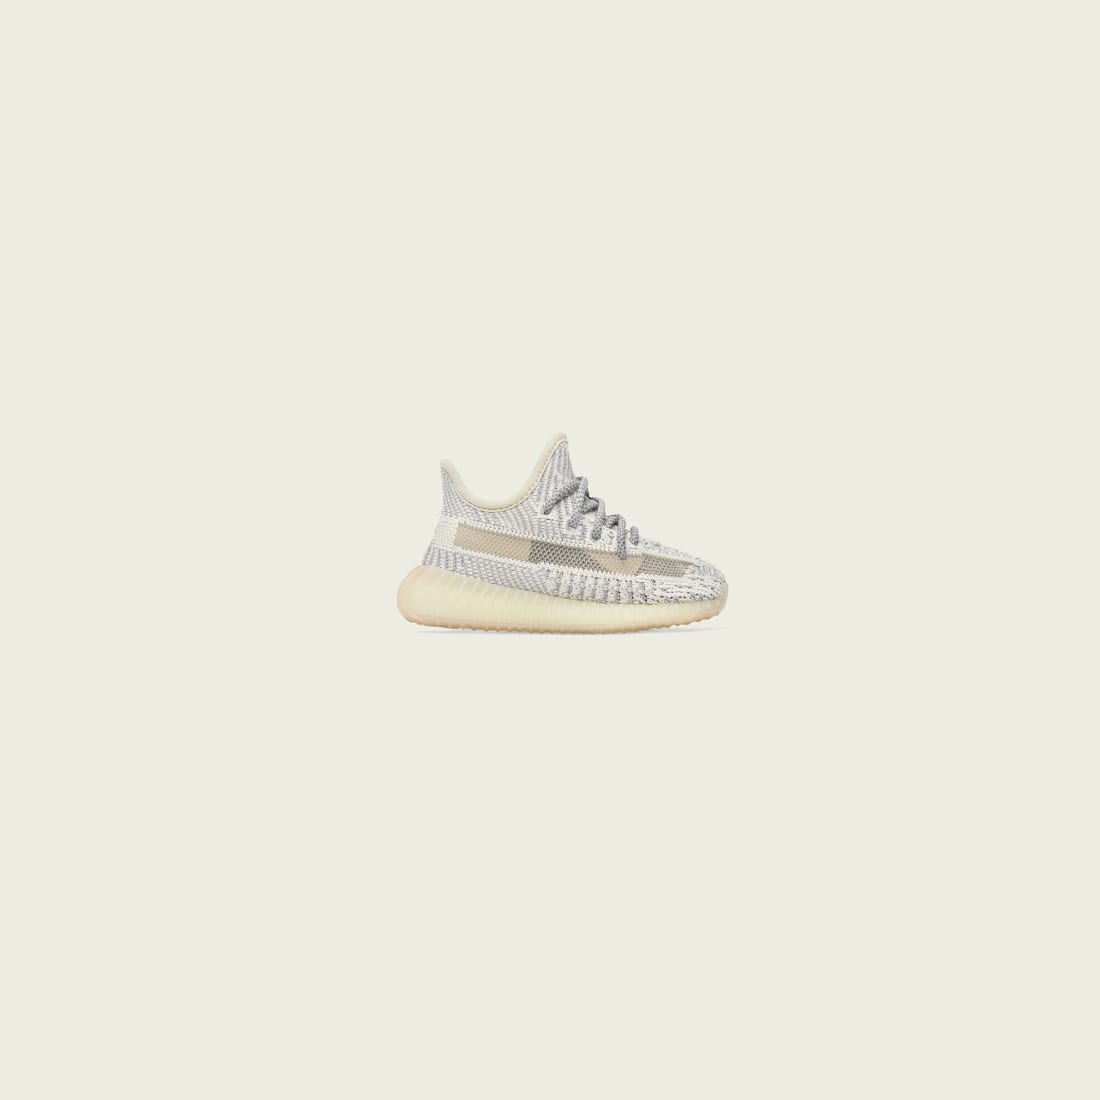 adidas Yeezy Boost 350 V2 Lundmark (Infant)